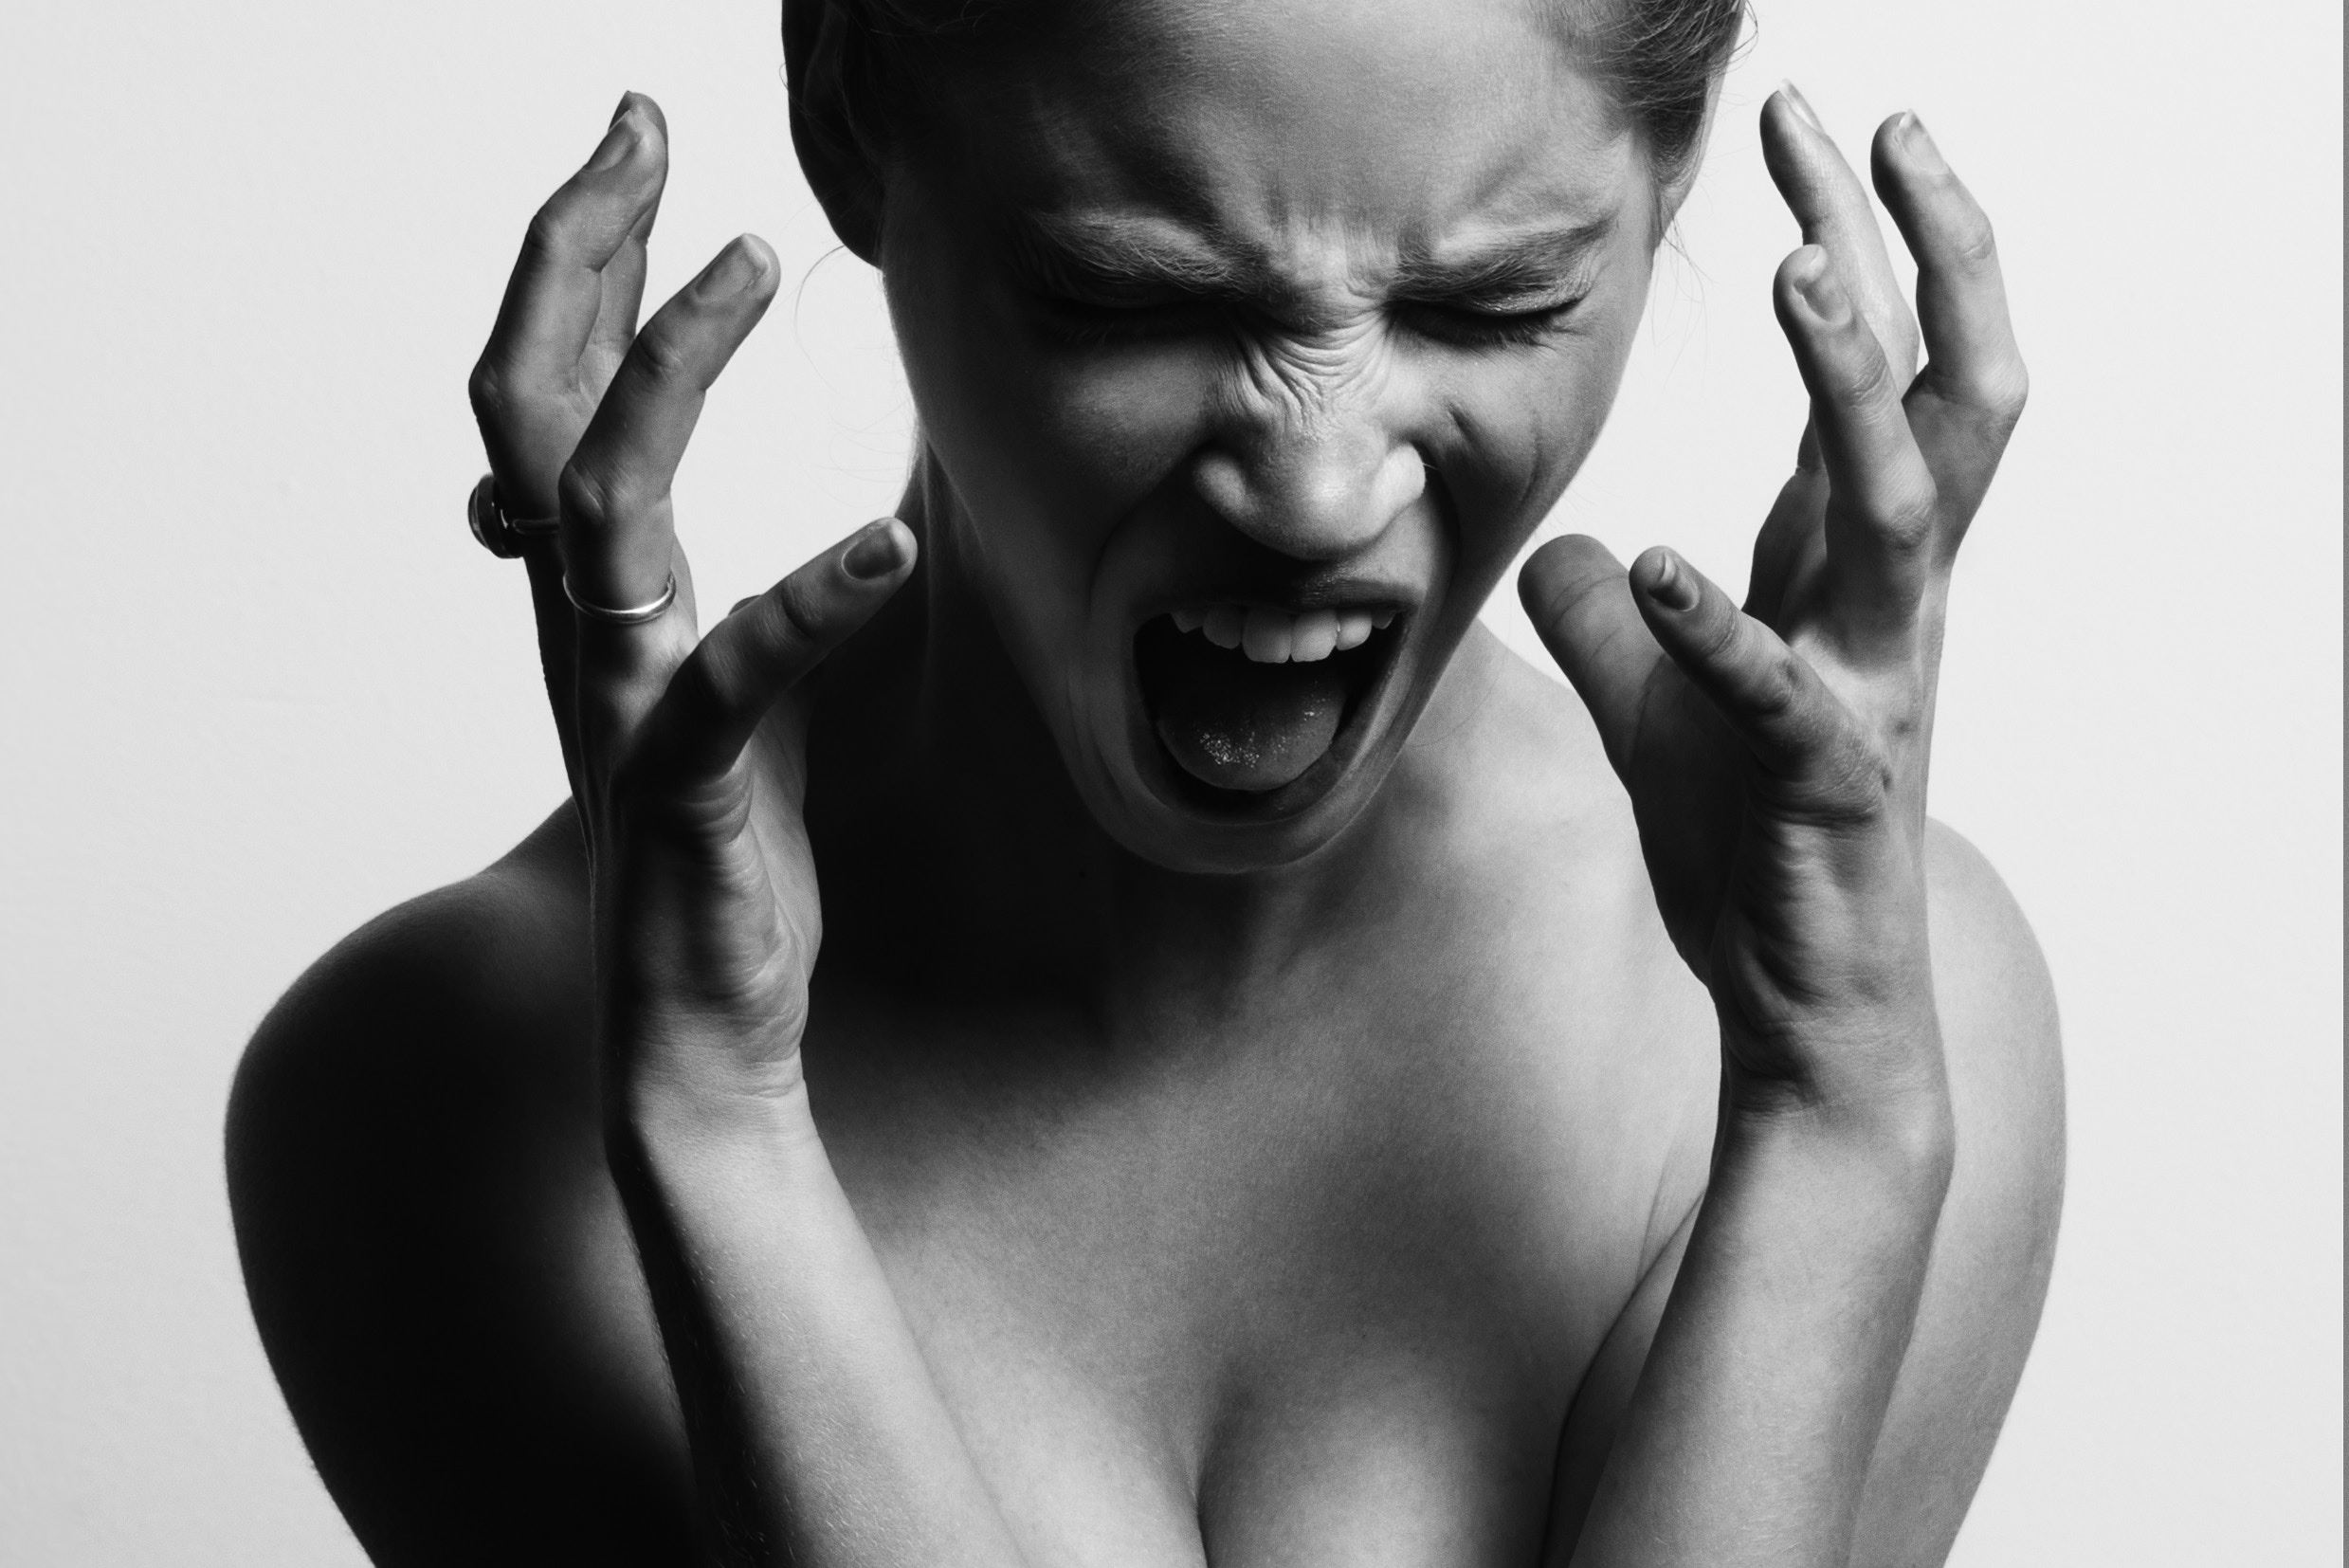 MINDFULNESS VID STRESS - KURS